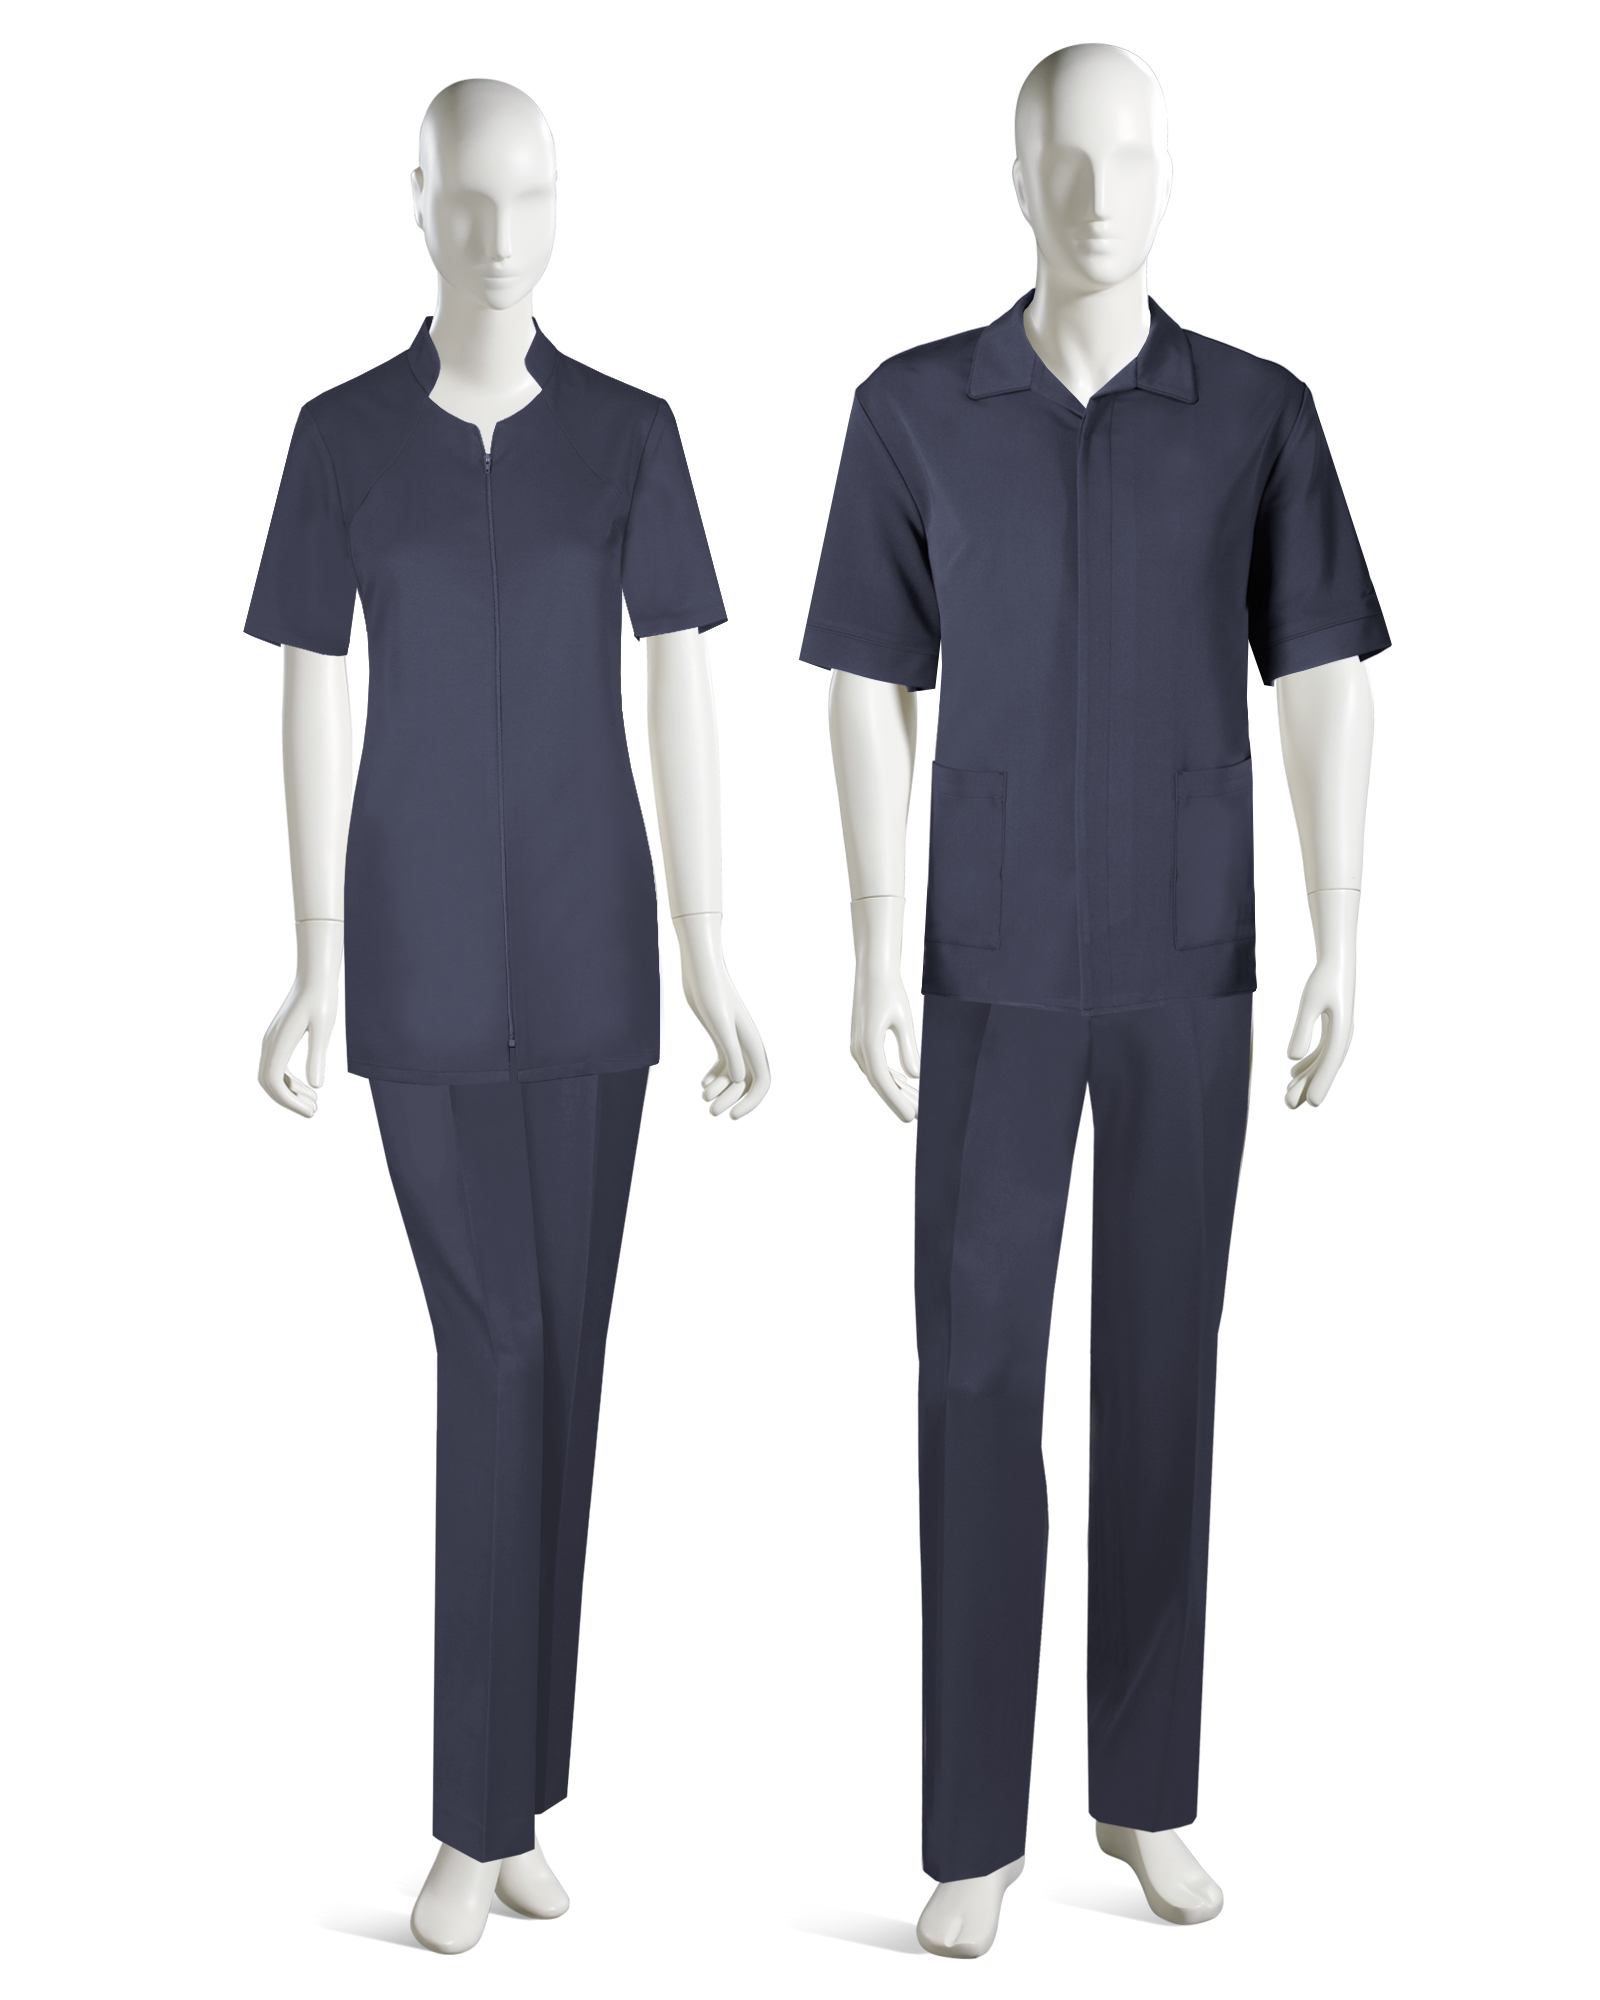 Sp167 for Spa receptionist uniform design